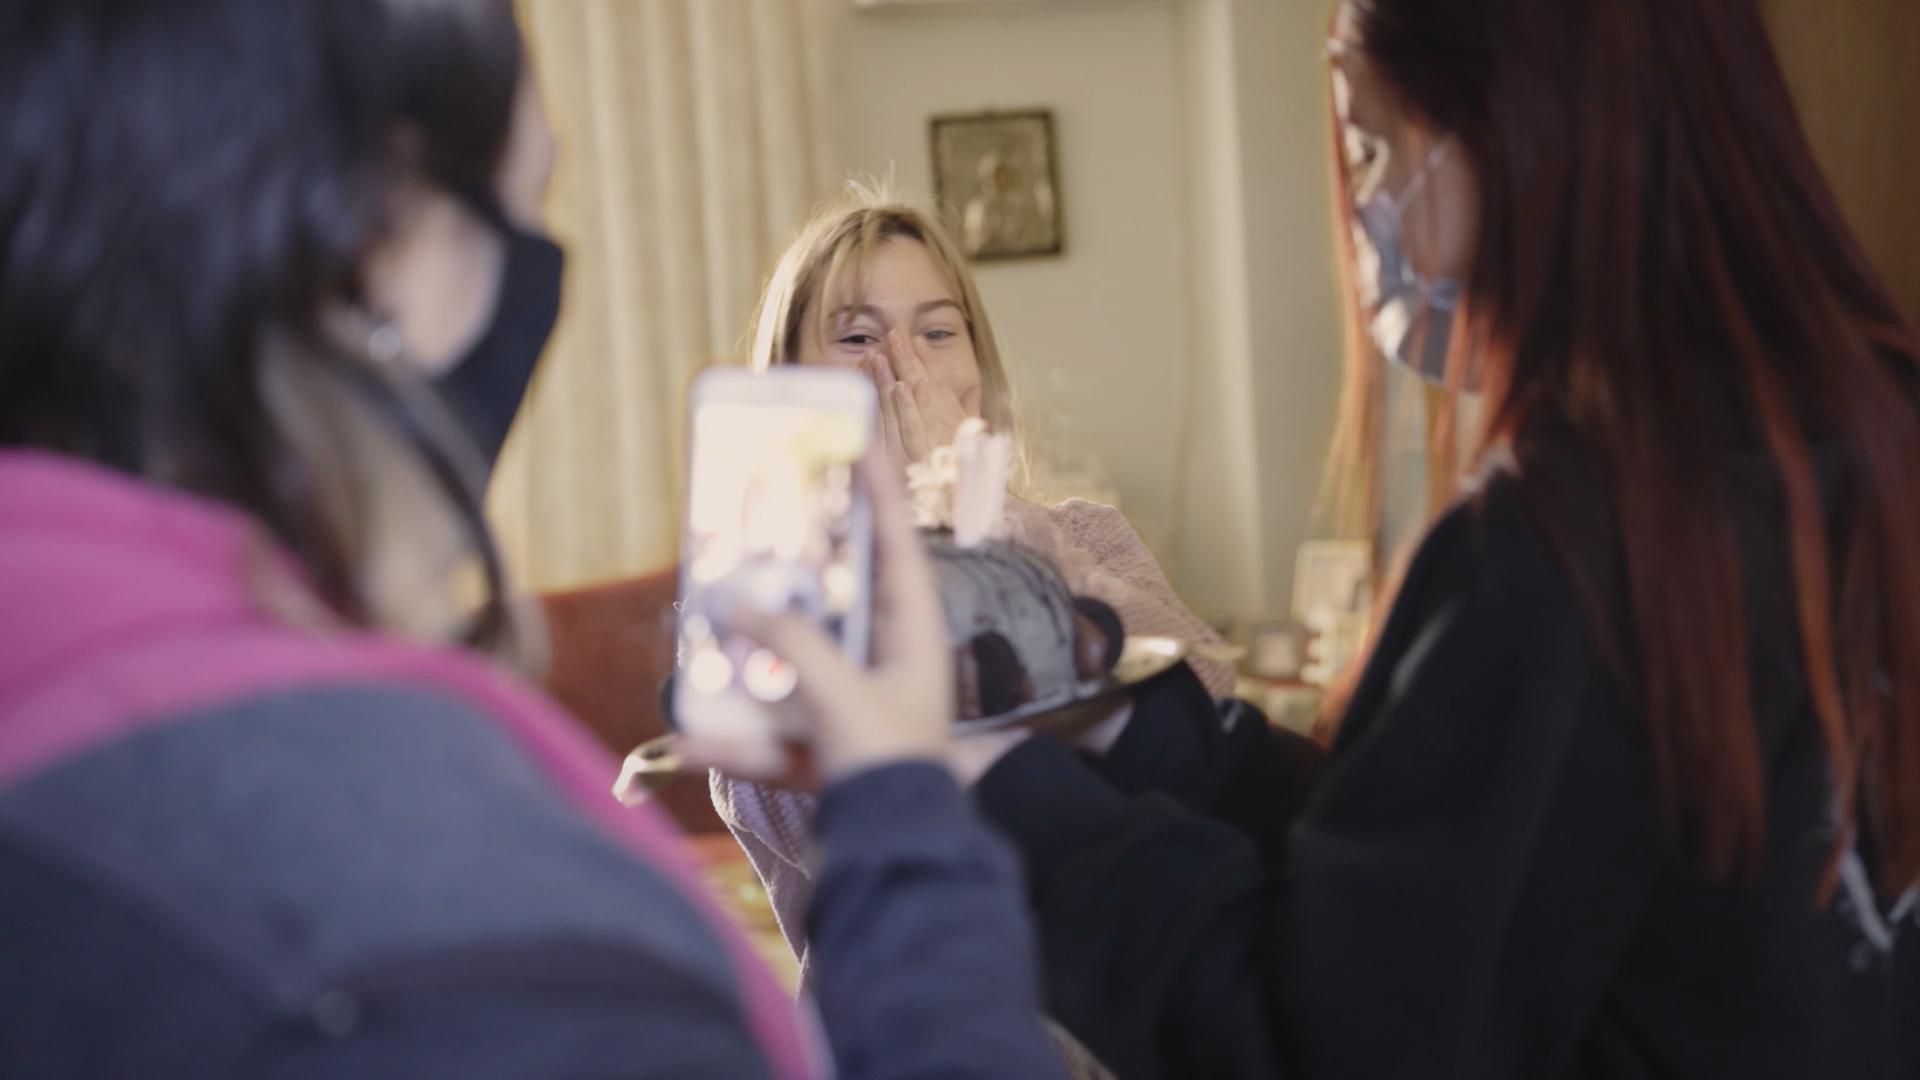 Girlhood: Το Onassis Culture παρουσιάζει το ντοκιμαντέρ της ζωής τριών κοριτσιών στην πανδημία